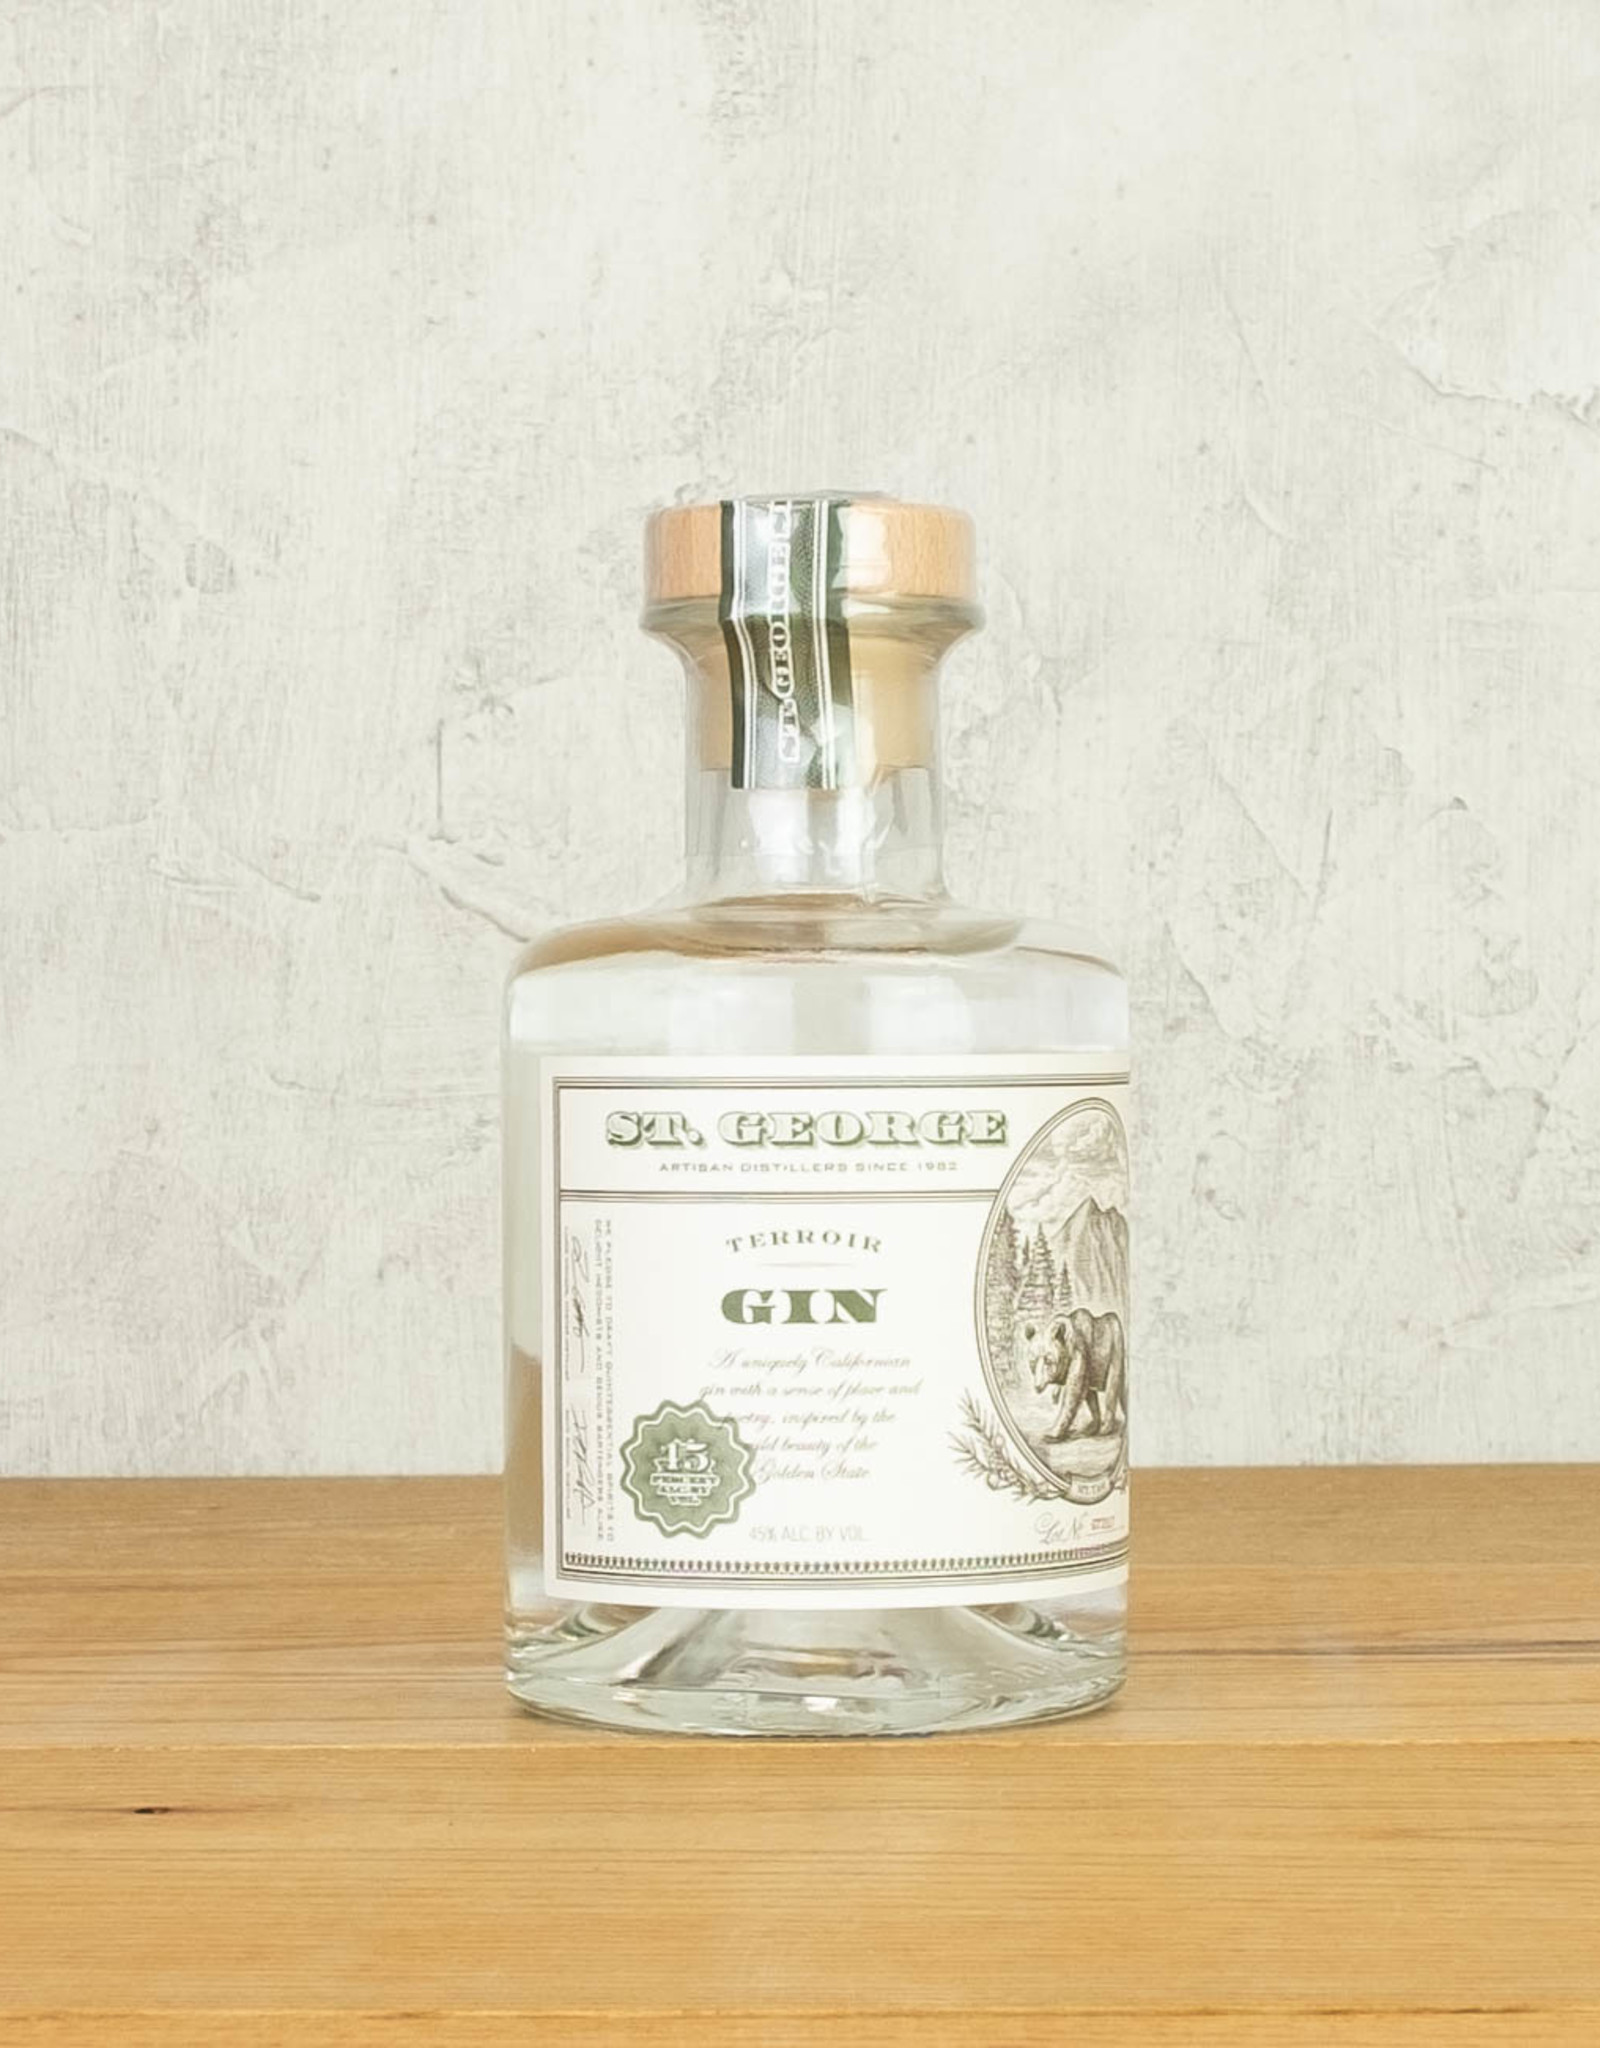 St George Terroir Gin 200ml